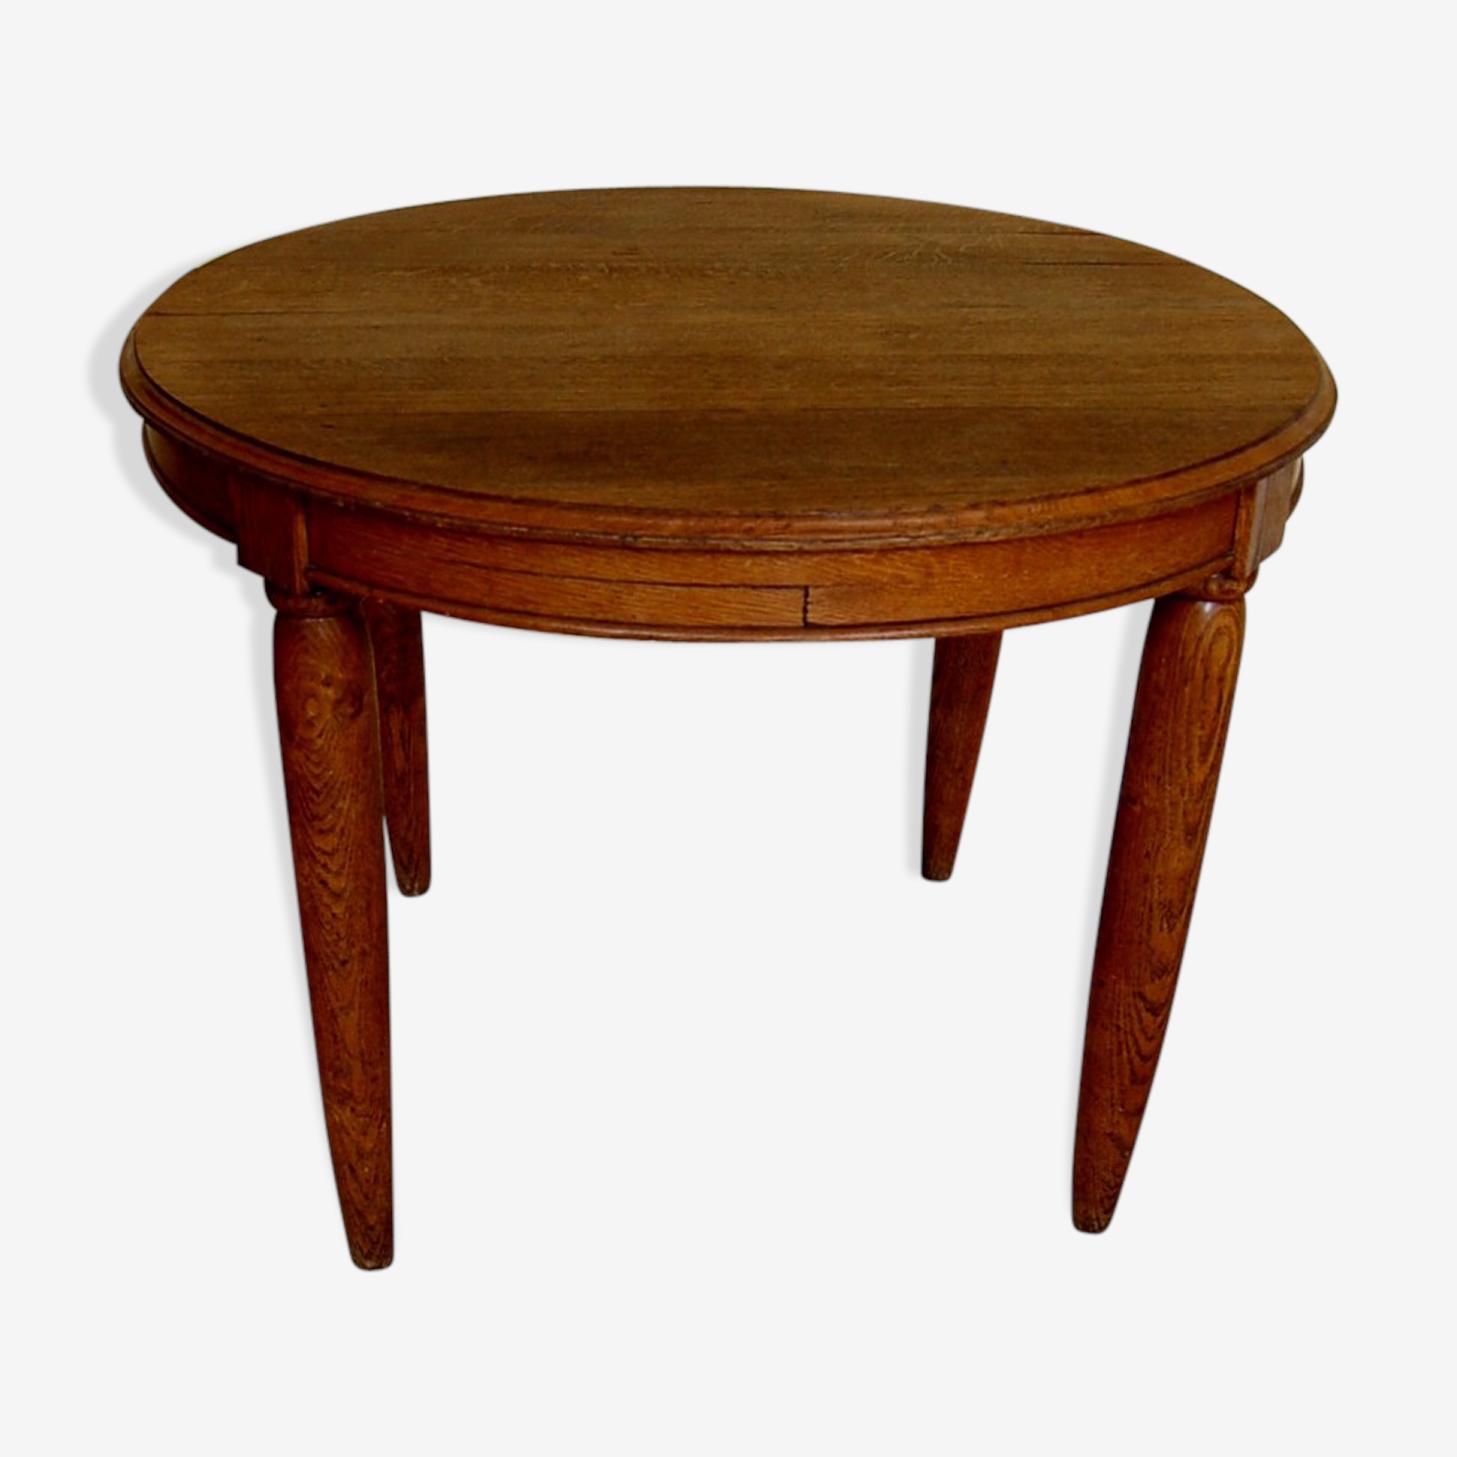 Table oval oak massif